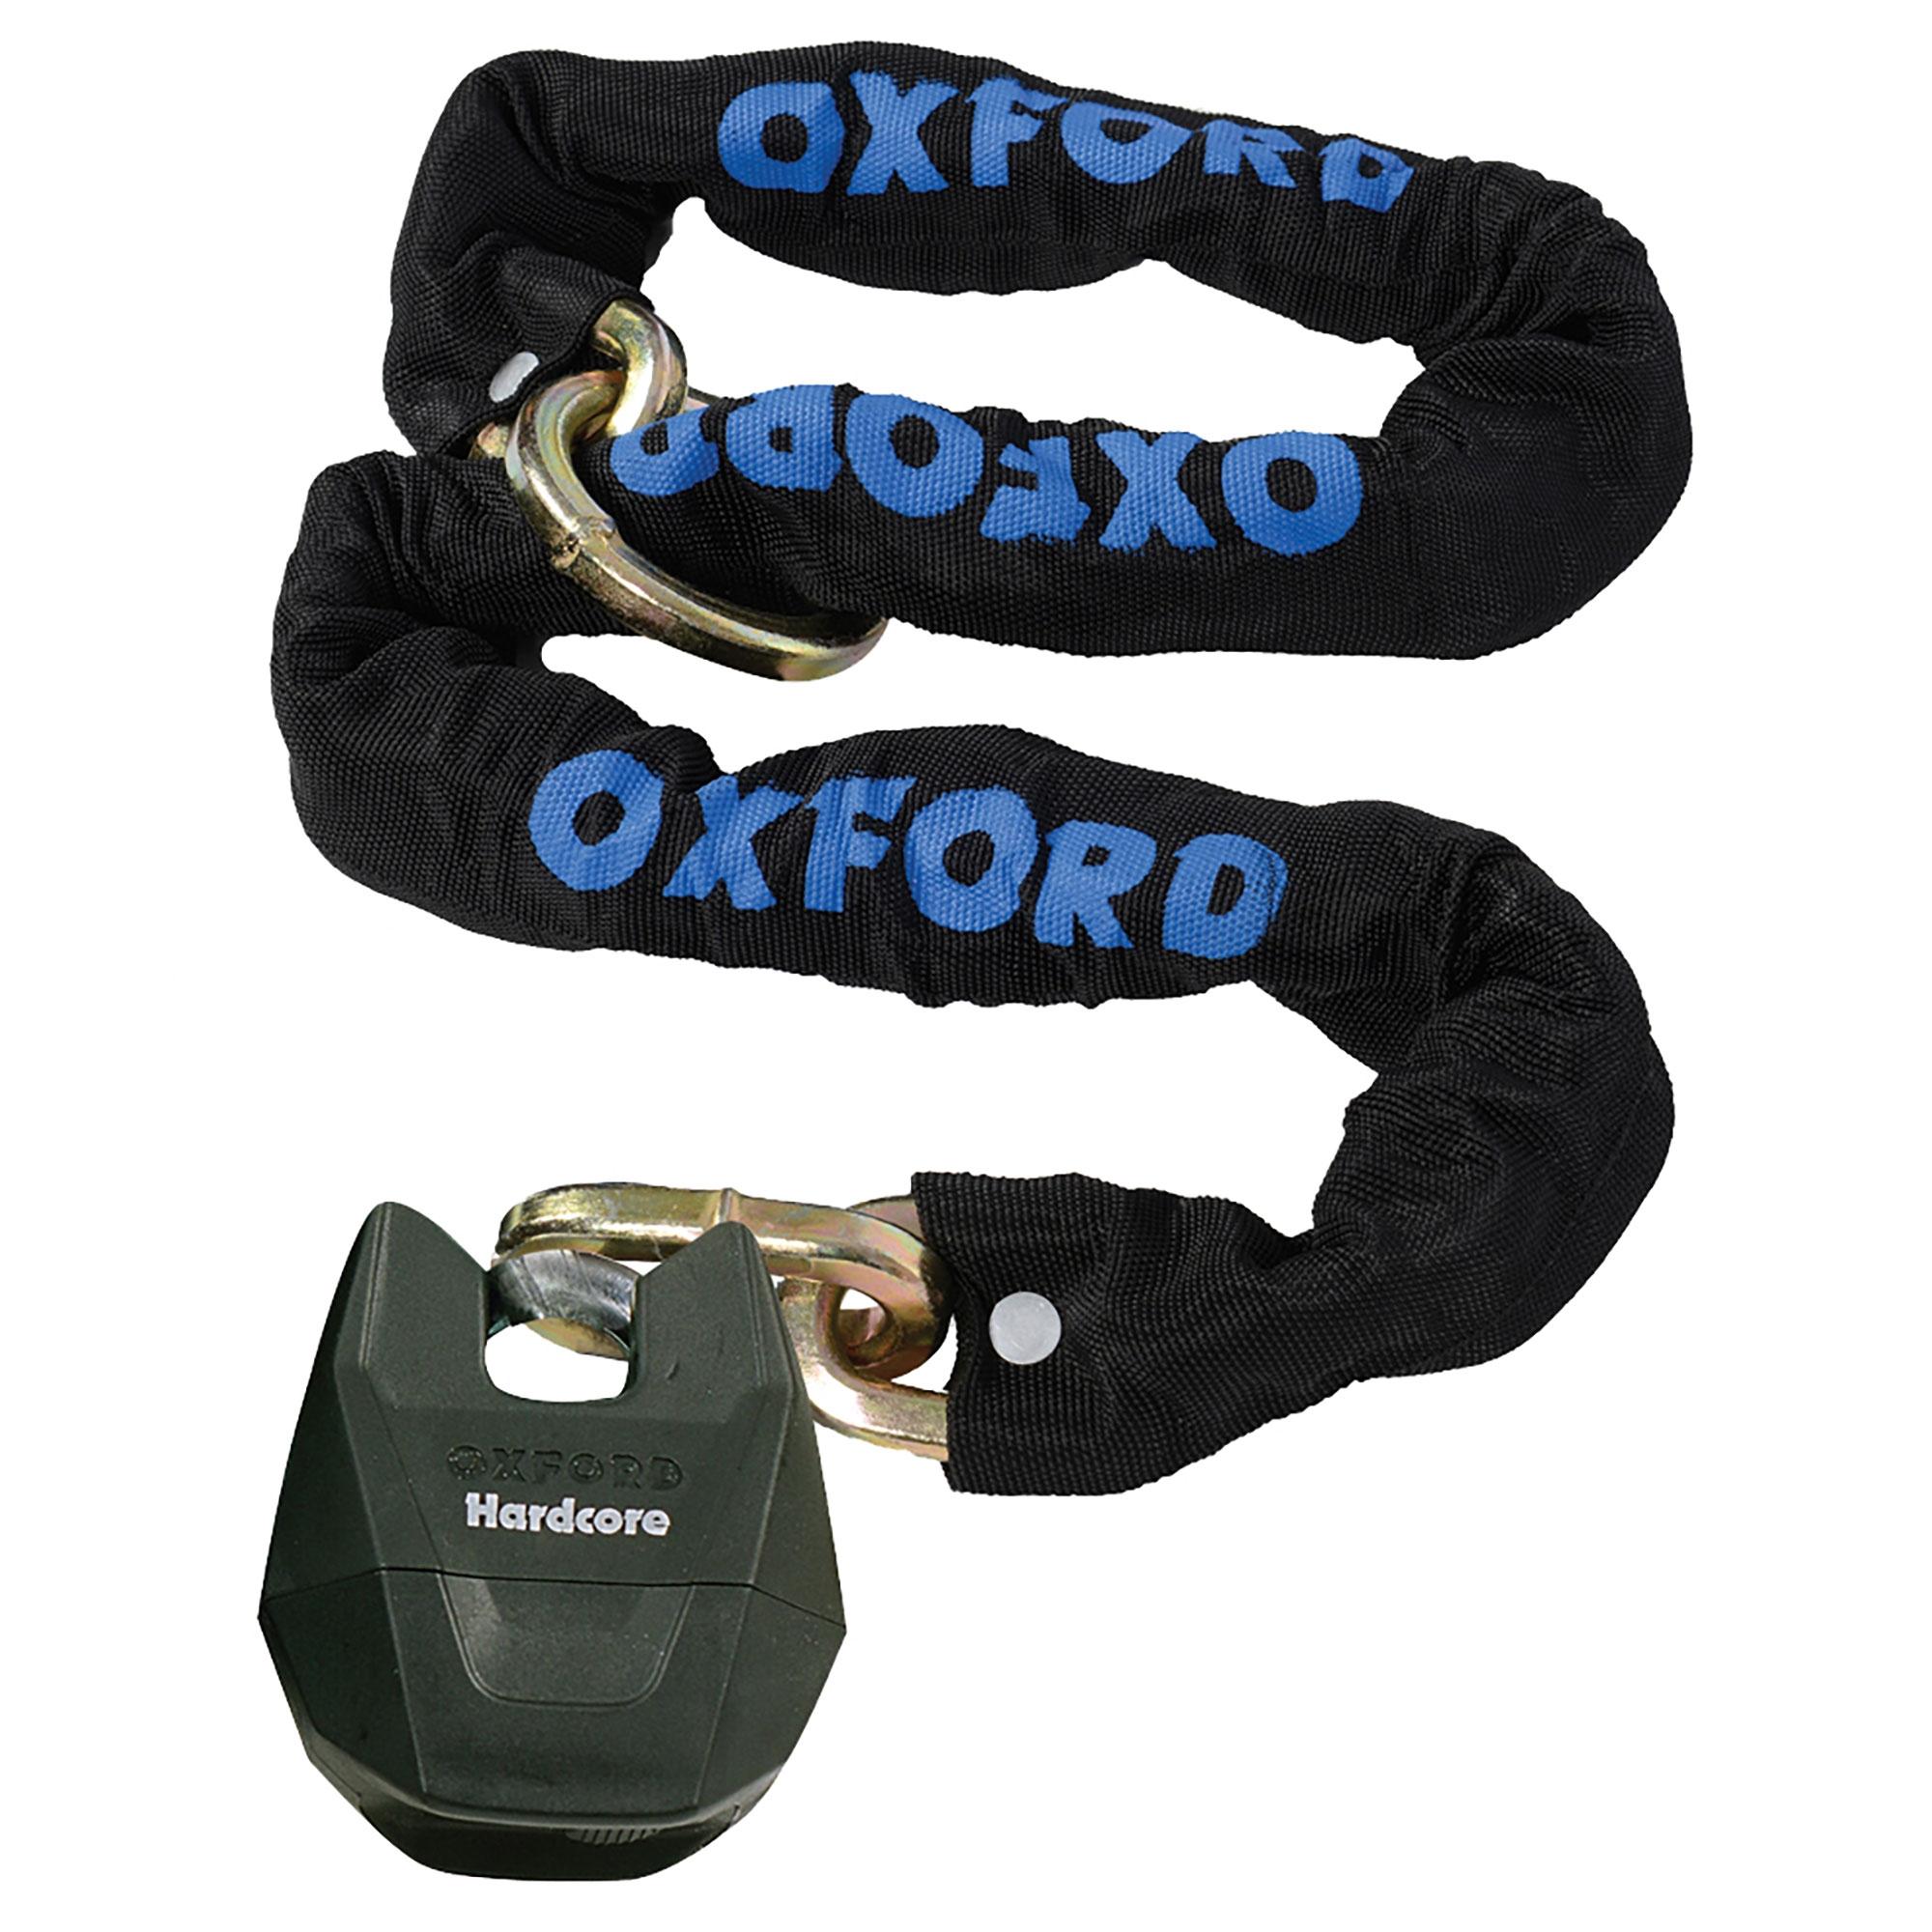 Oxford Hardcore XL LK153 Thatcham Approved 1.5 Metre x 12mm Loop Chain /& Padlock